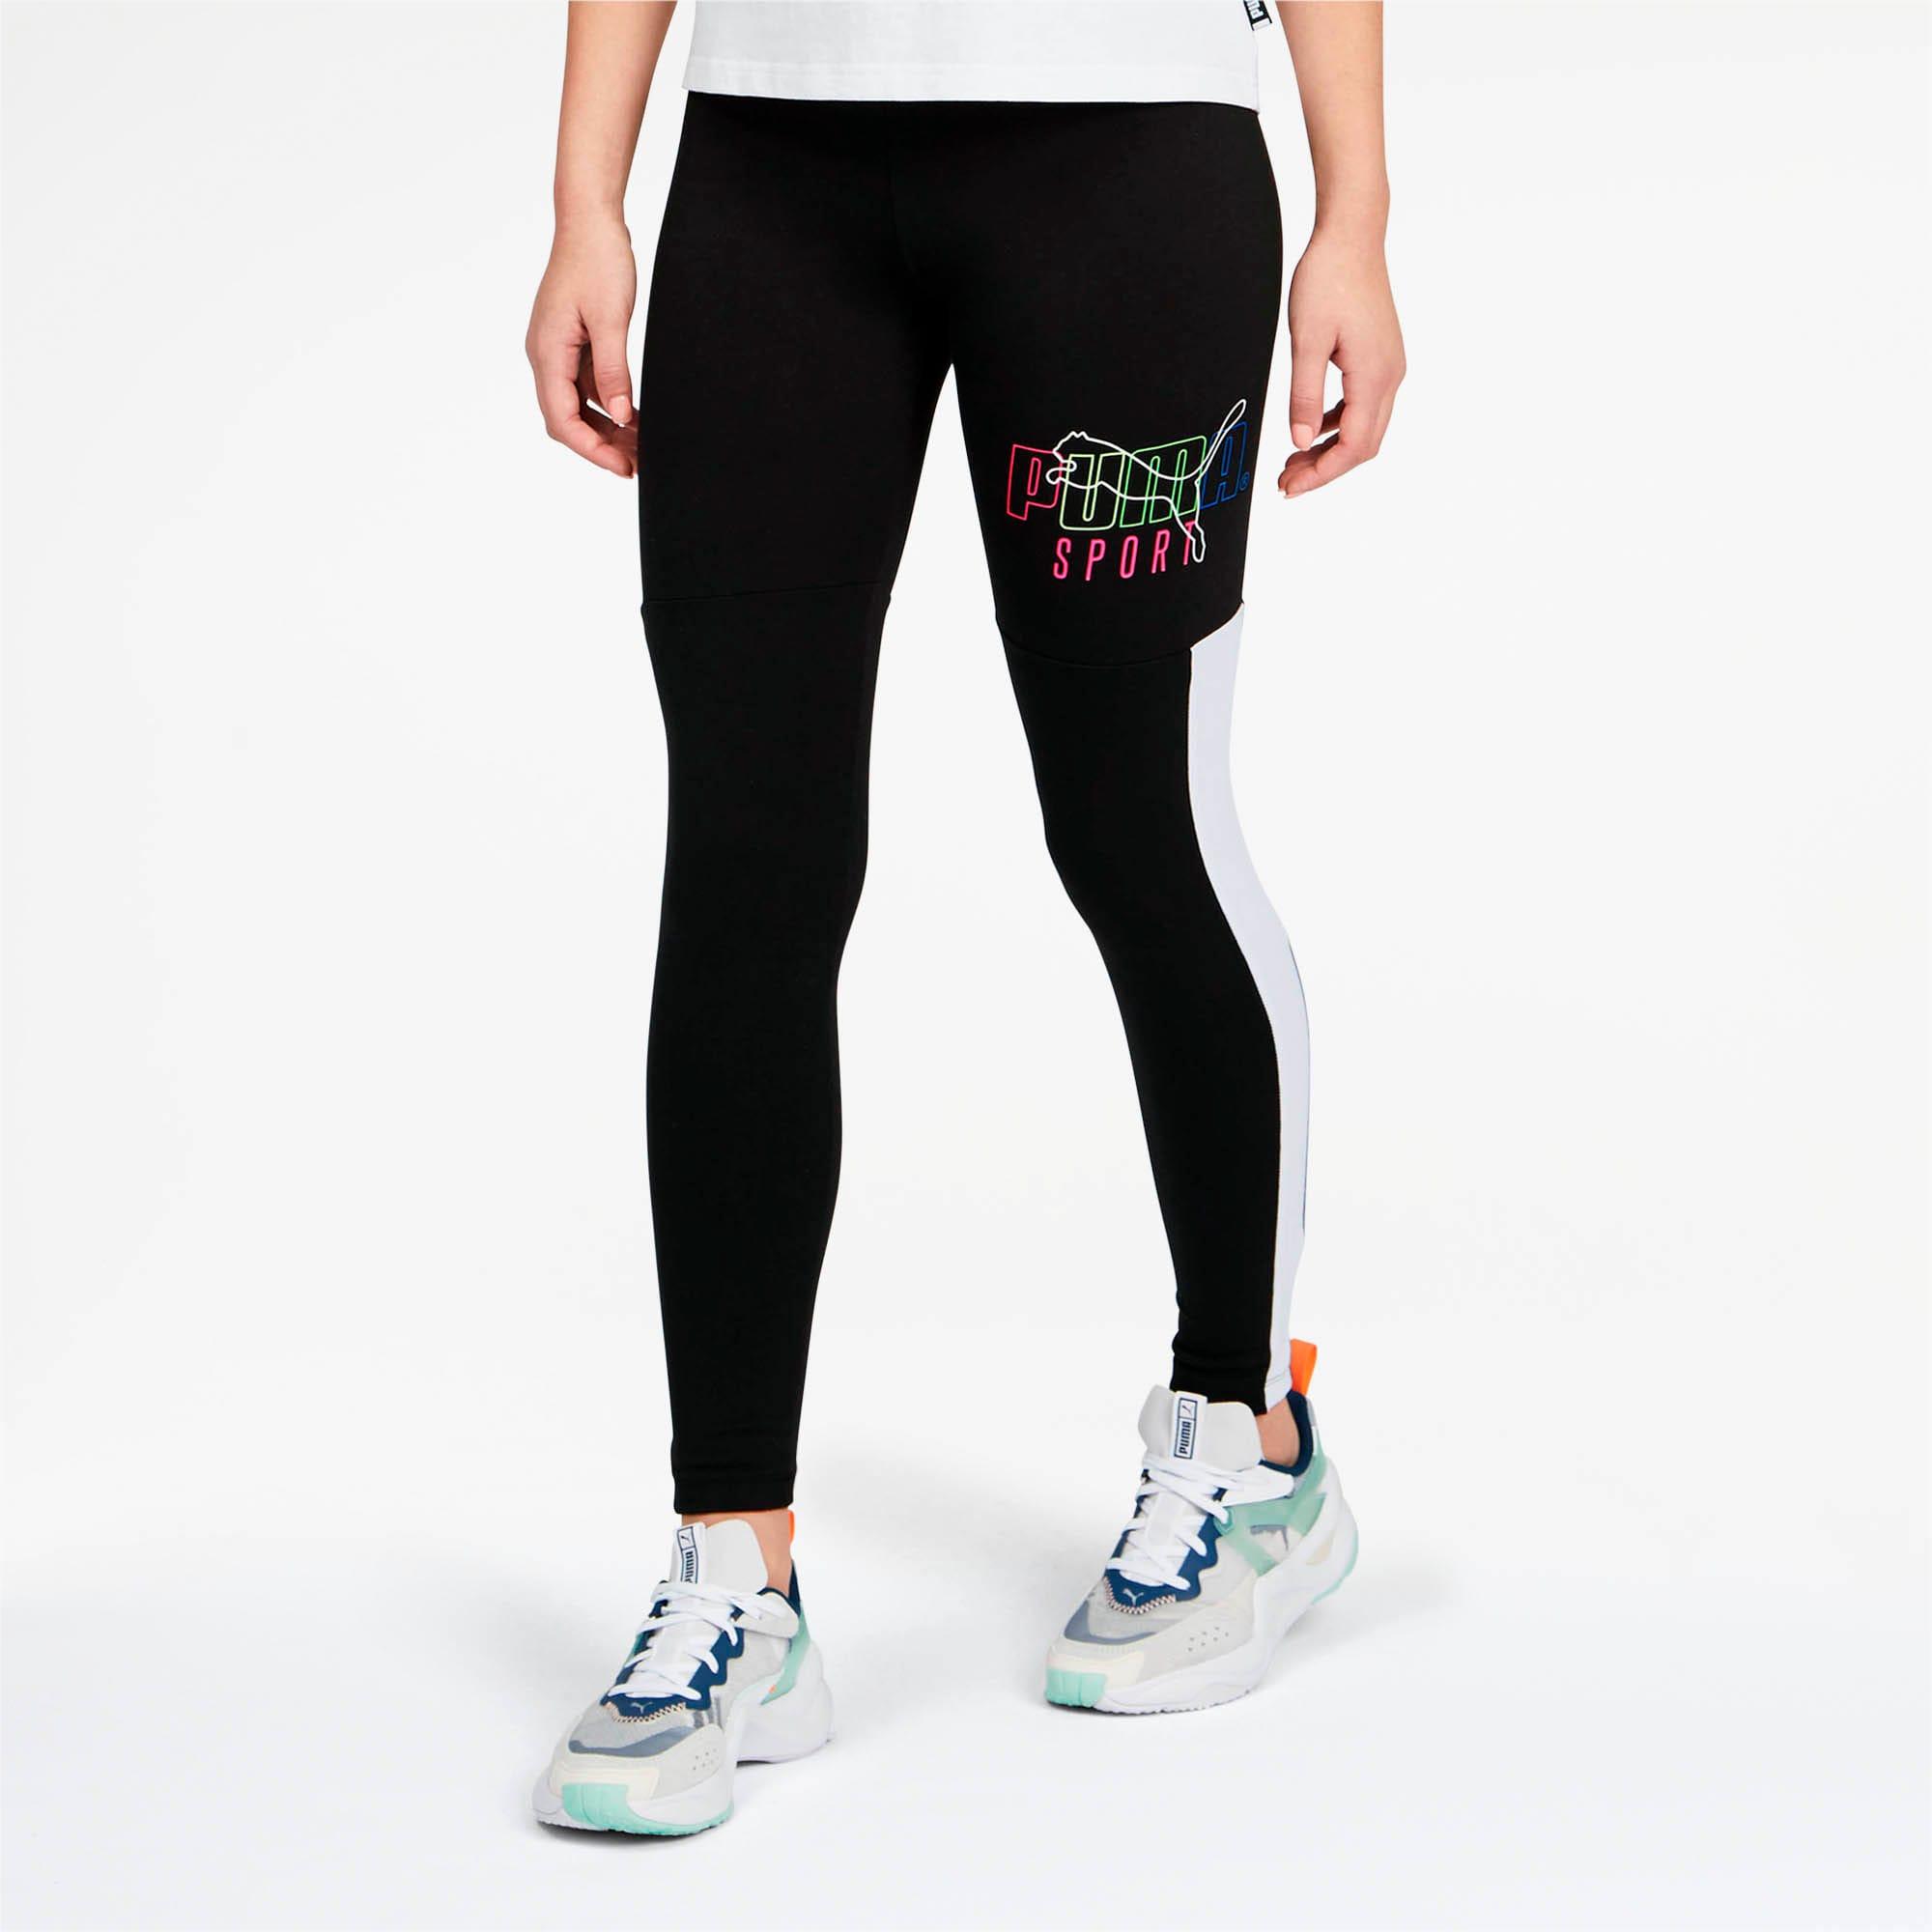 PUMA Sport Leggings